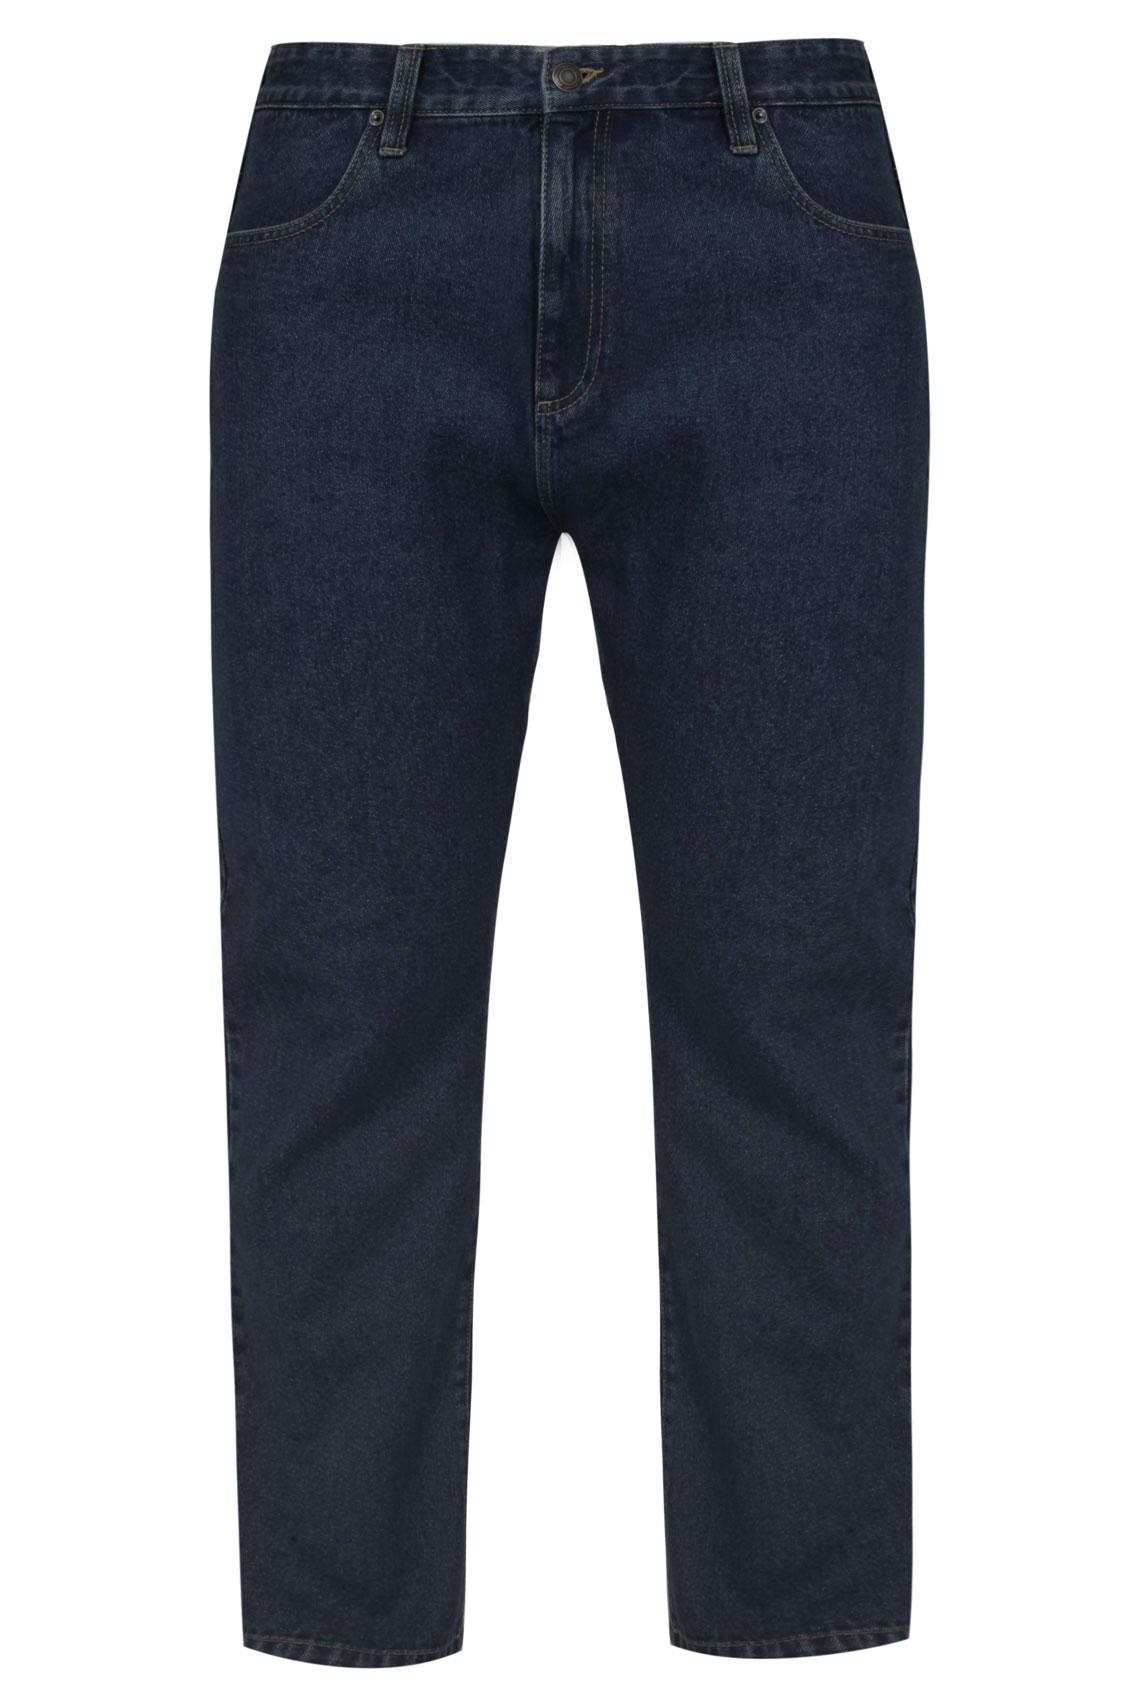 BadRhino Indigo Denim Straight Leg Stretch Jeans